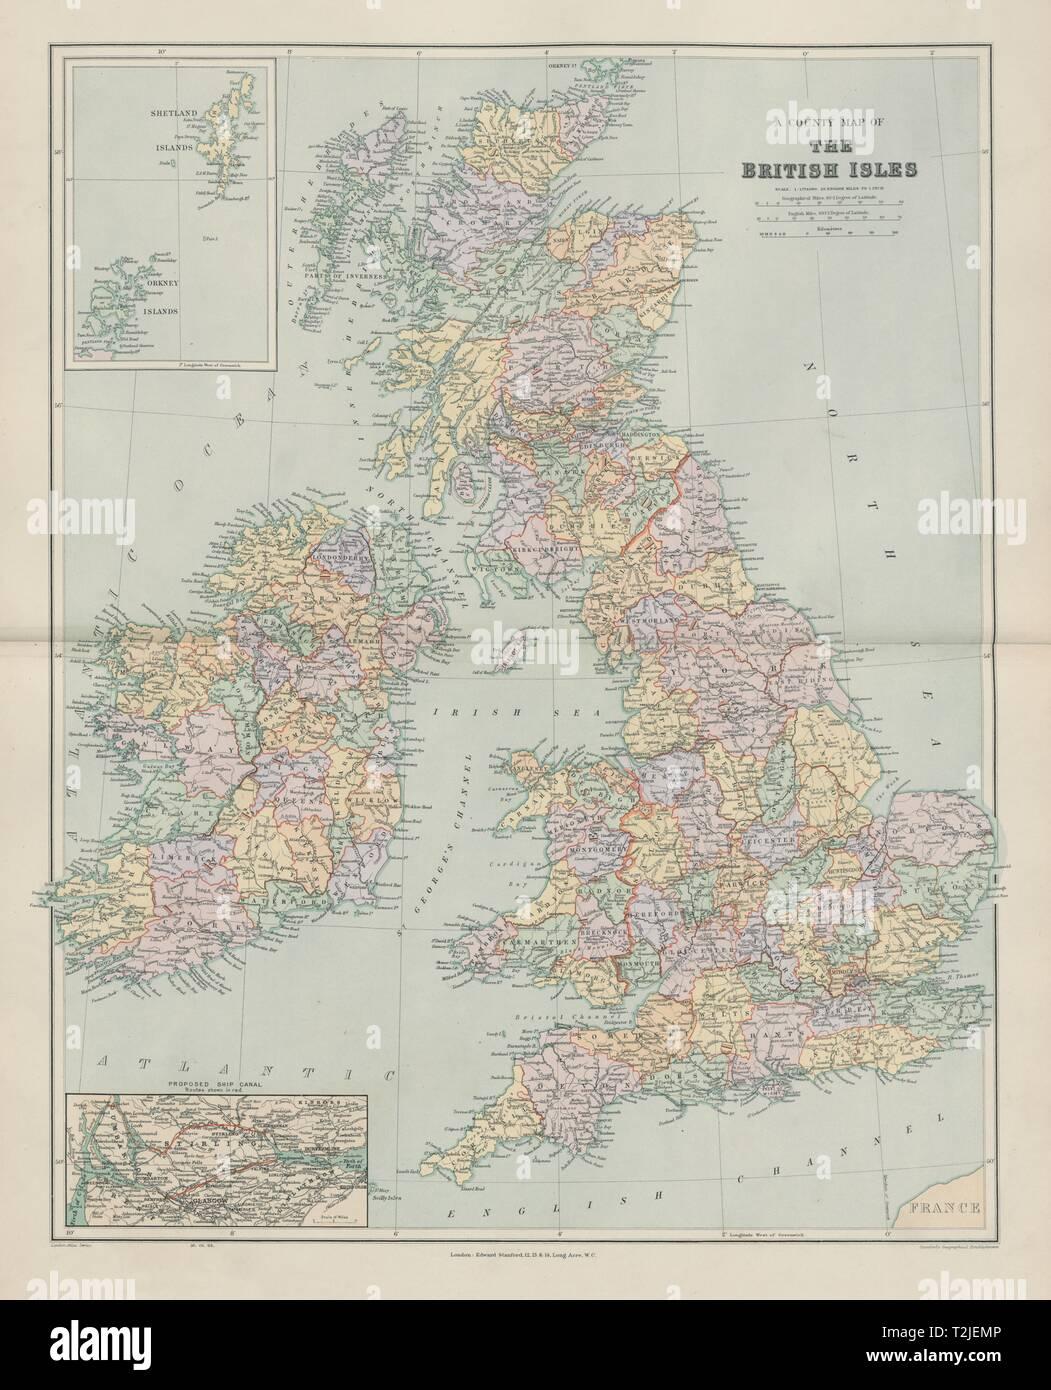 Carte Angleterre Ecosse.County Carte Des Iles Britanniques Angleterre Ecosse Irlande Pays